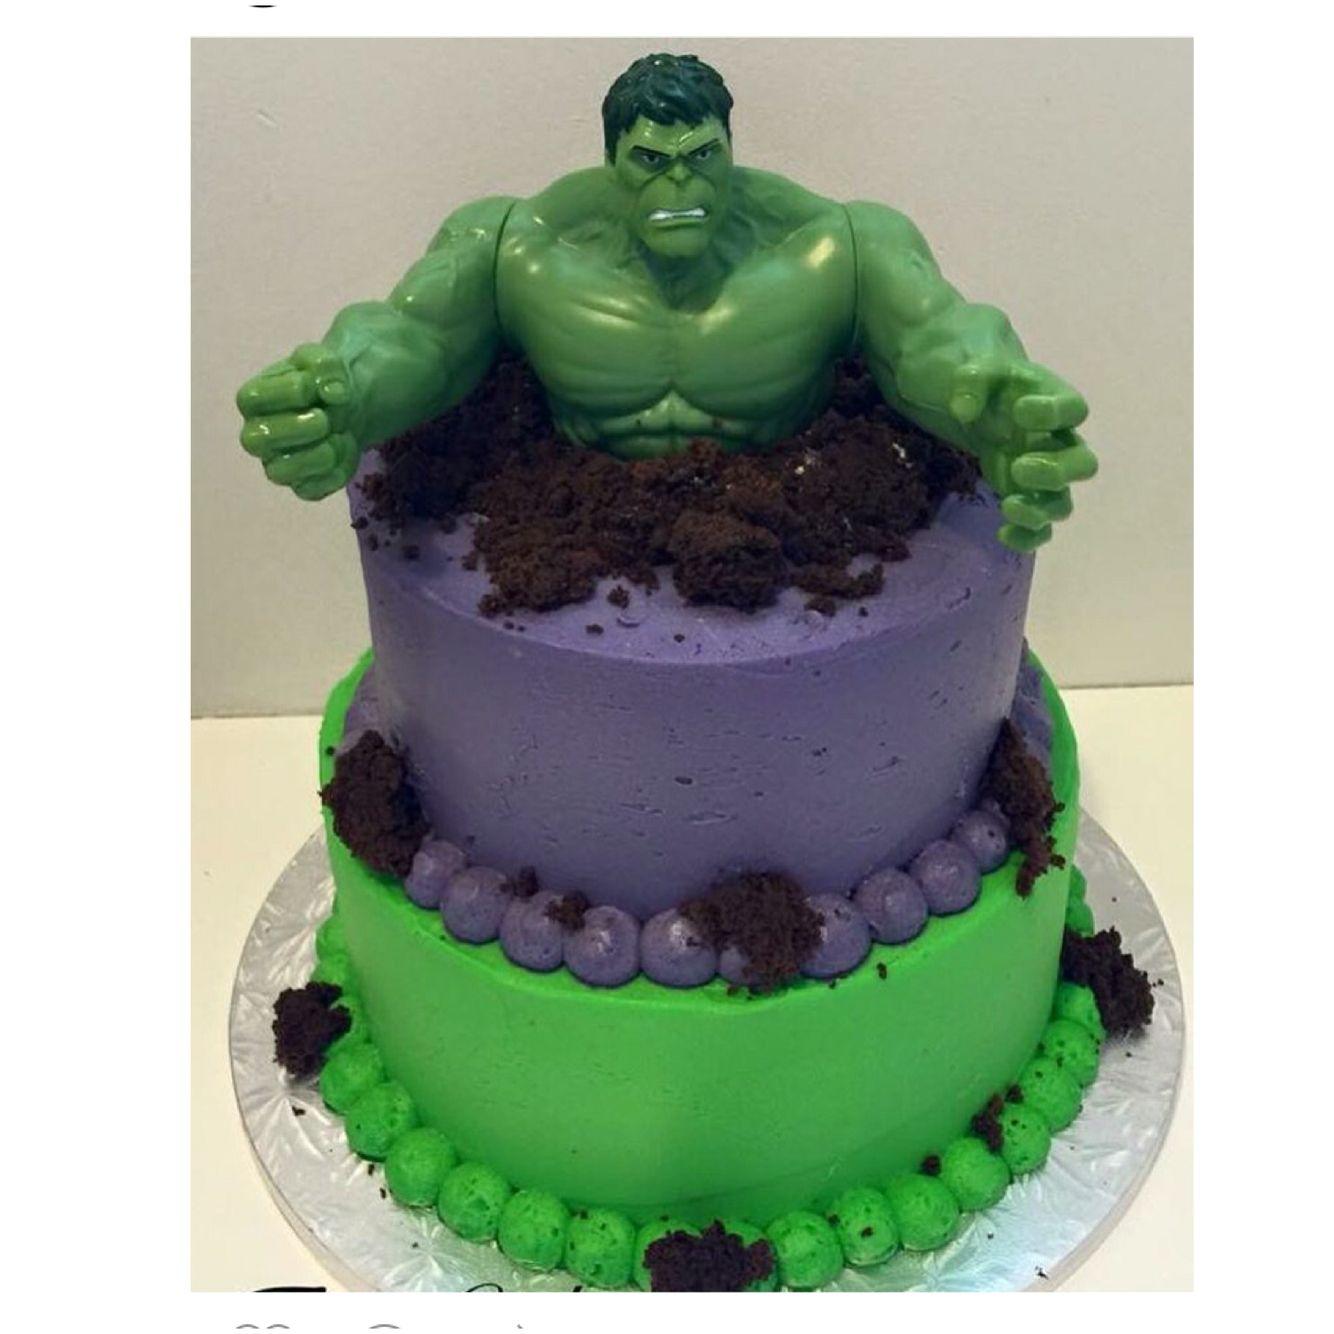 Cake Design Hulk : Hulk cake Party ideas Pinterest Hulk cakes, Hulk and ...